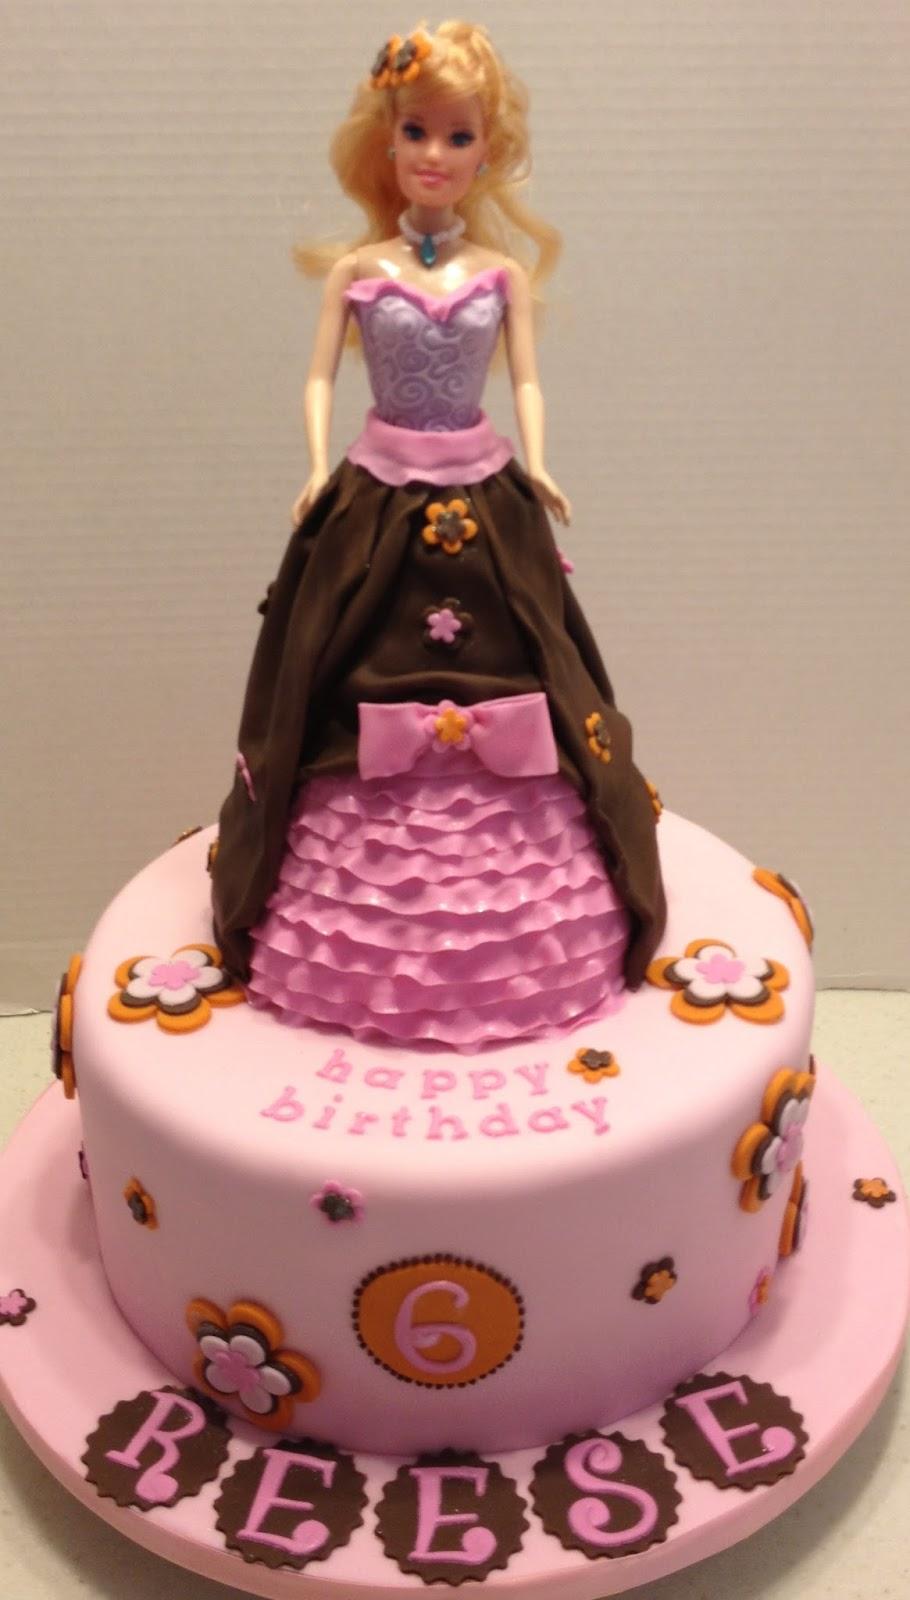 Barbie Chocolate Cake Images : MaryMel Cakes: A Barbie Birthday